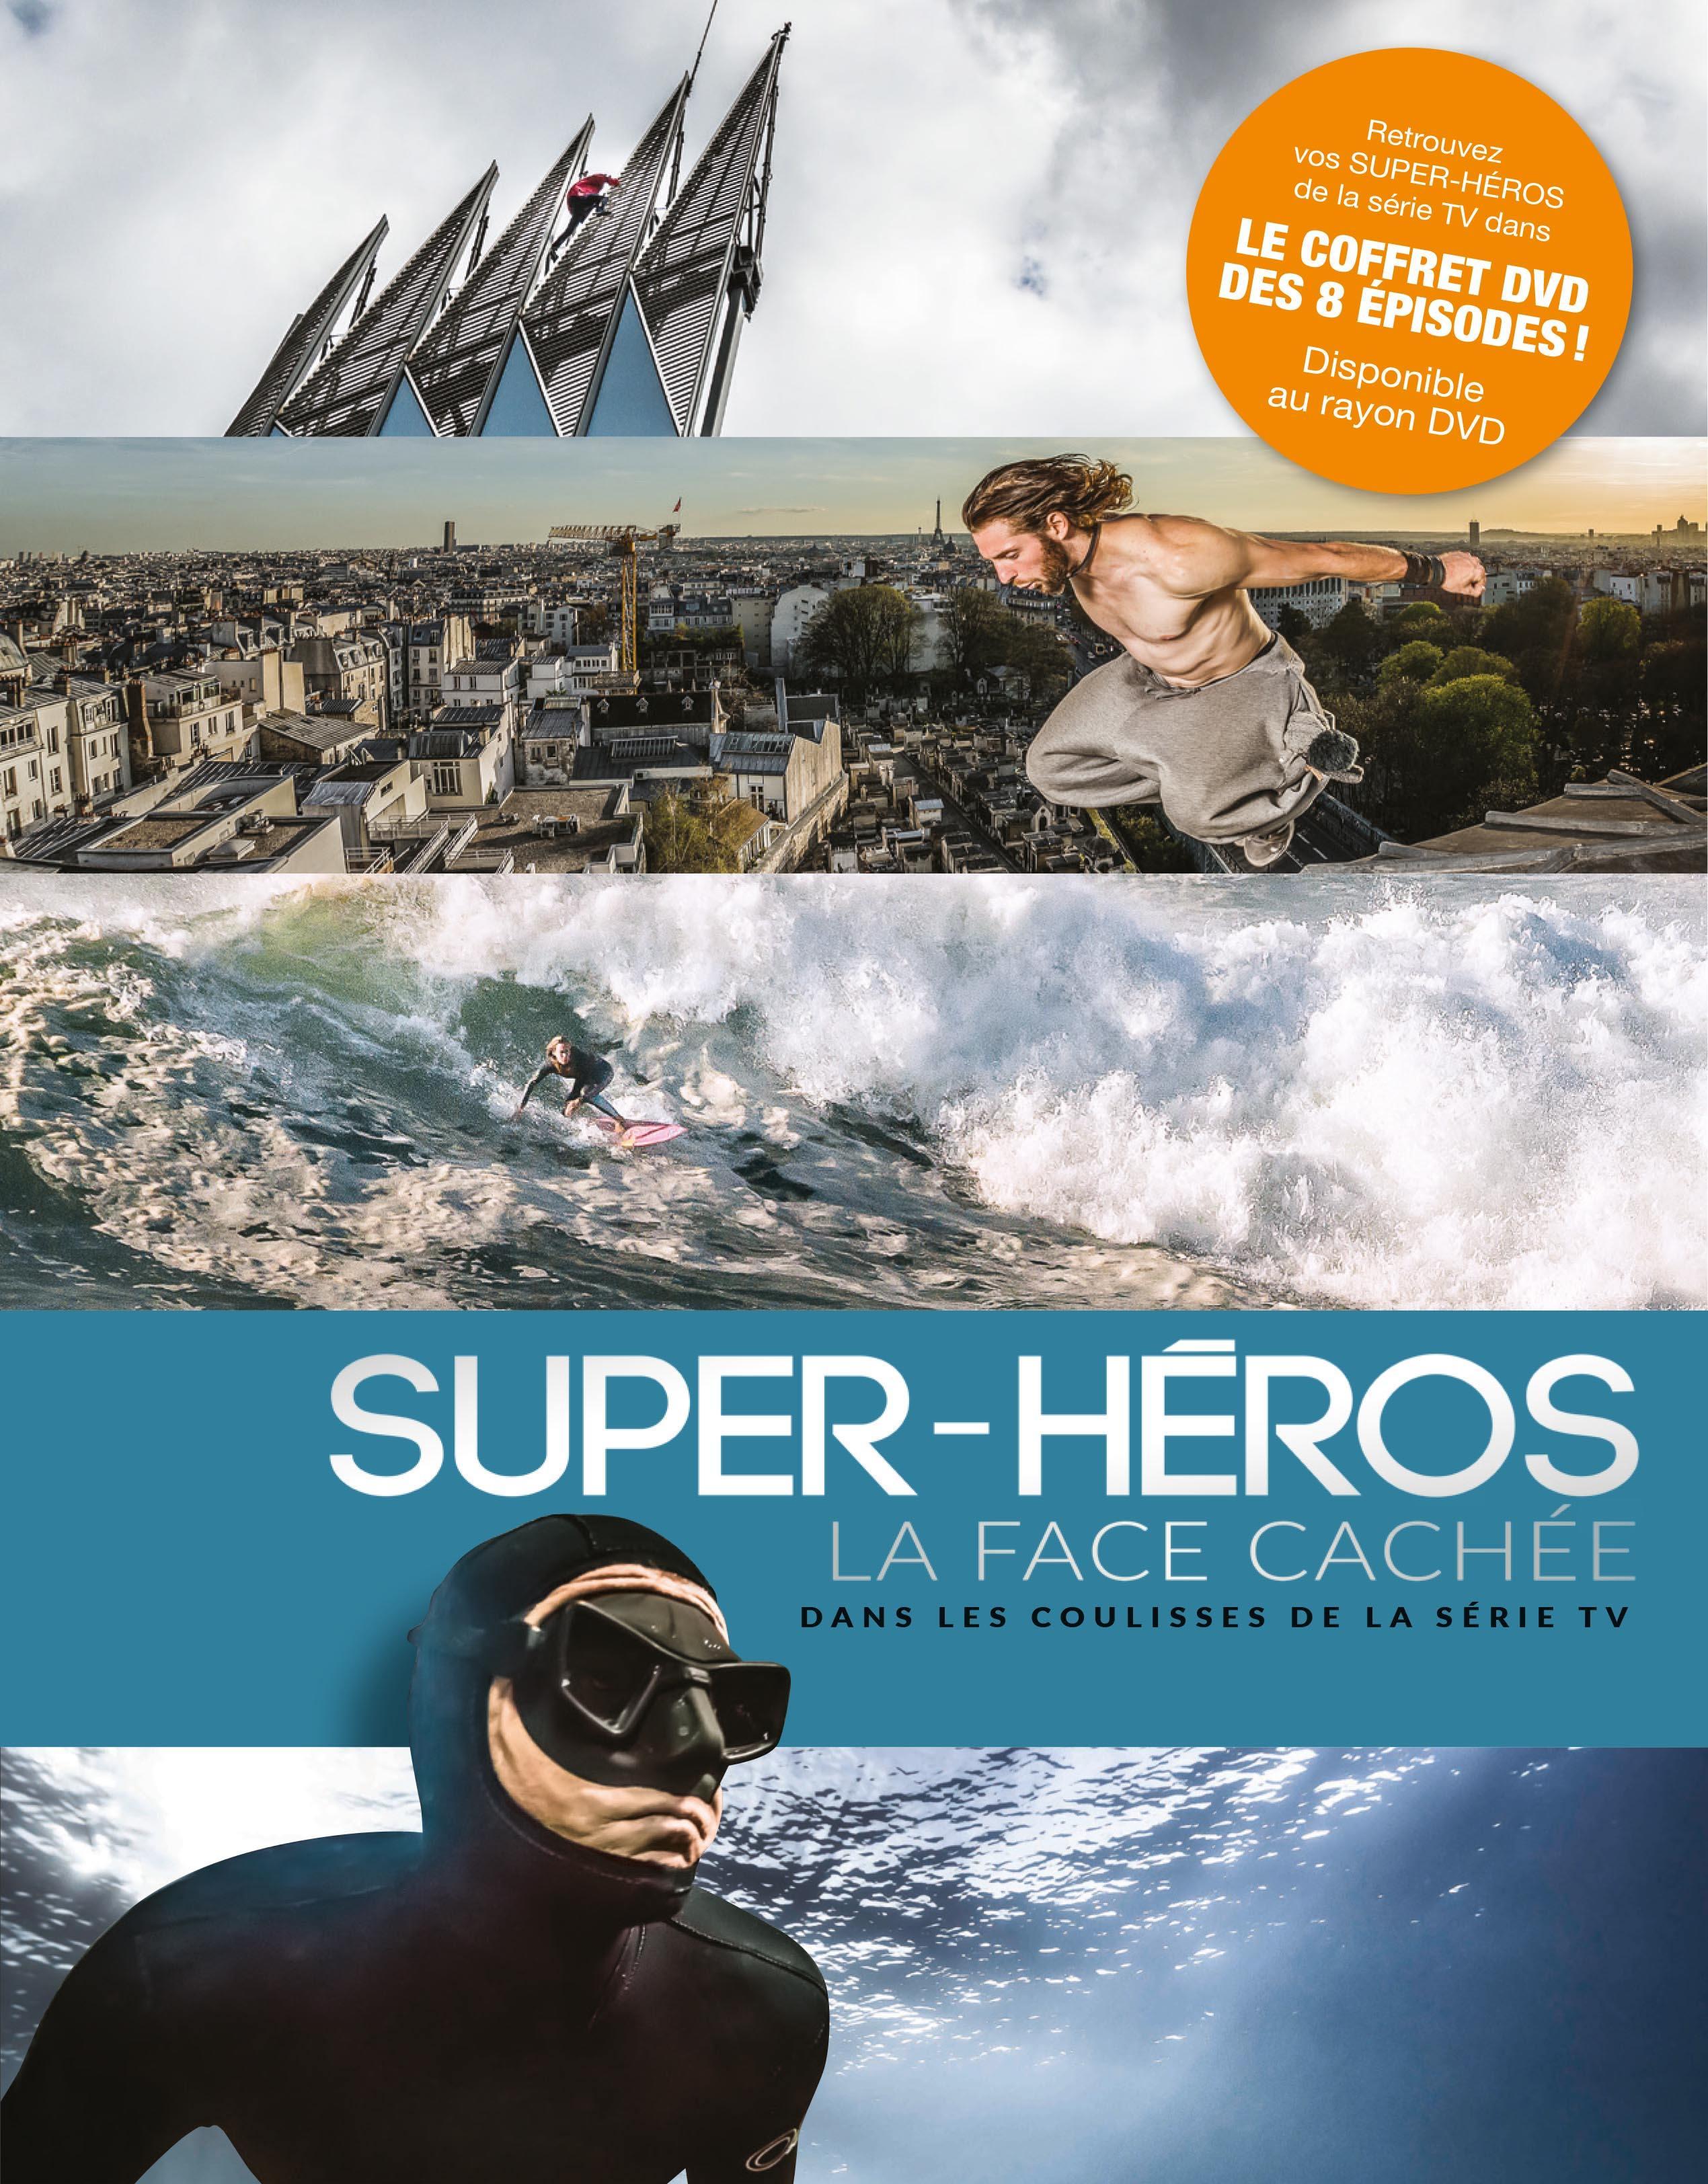 Super heros la face cachee - 8 dvd